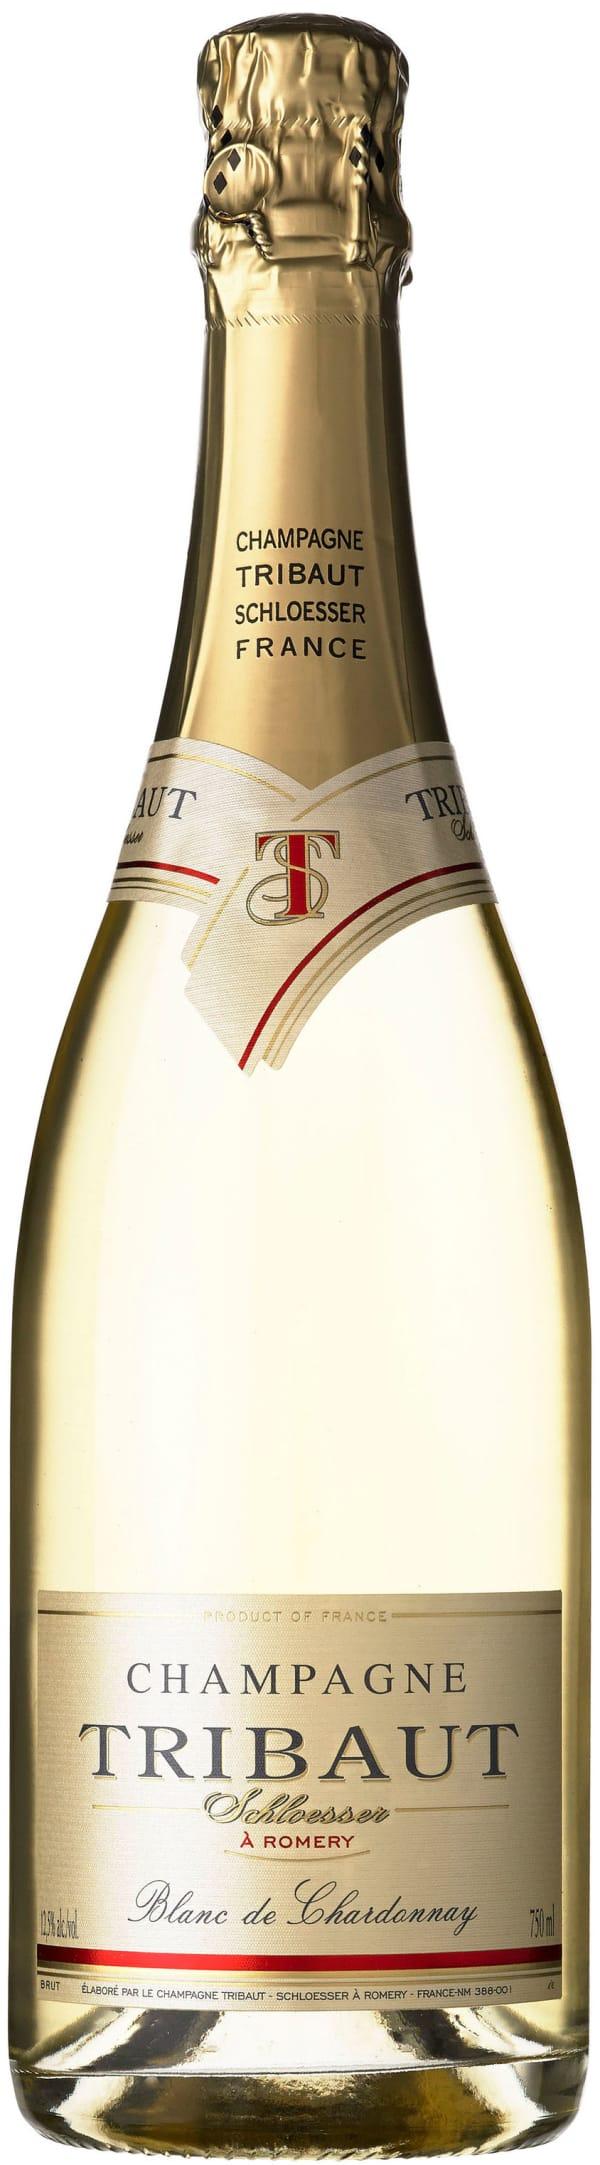 Tribaut Blanc de Chardonnay Champagne Brut